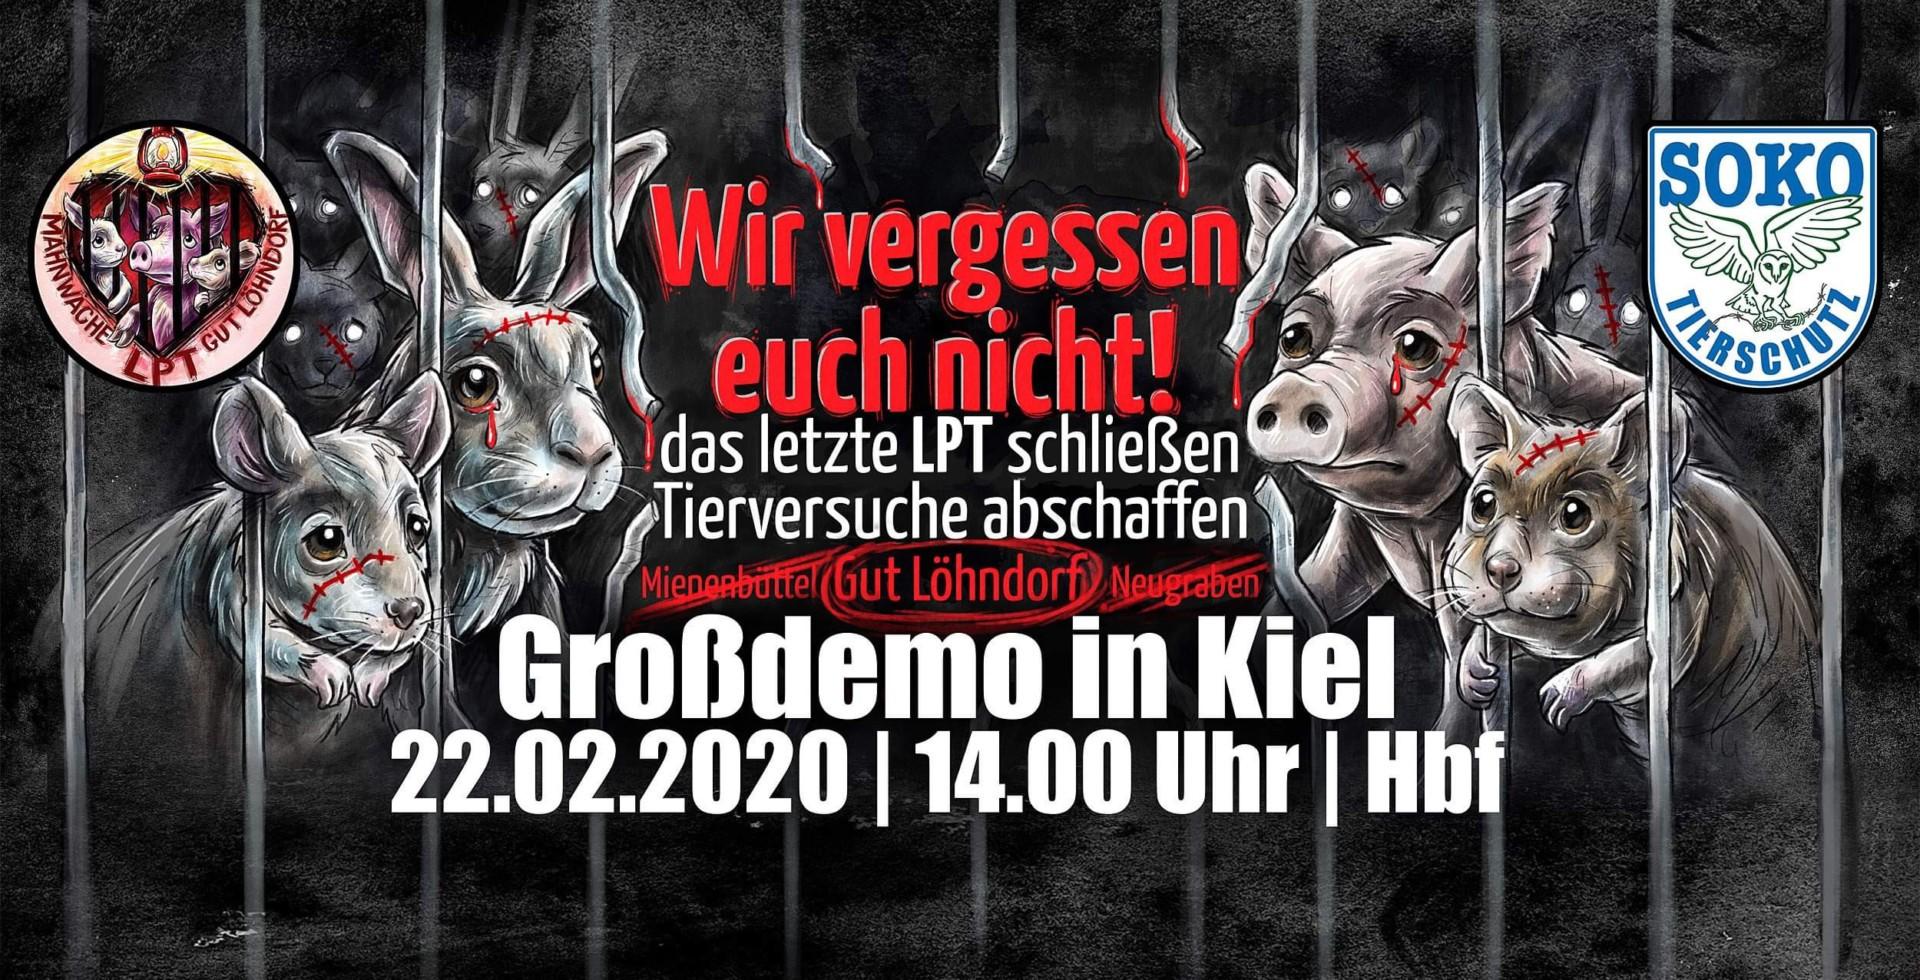 img 3565 - Groß-Demo in Kiel (22.02.) - LPT-Giftlabor sofort schließen